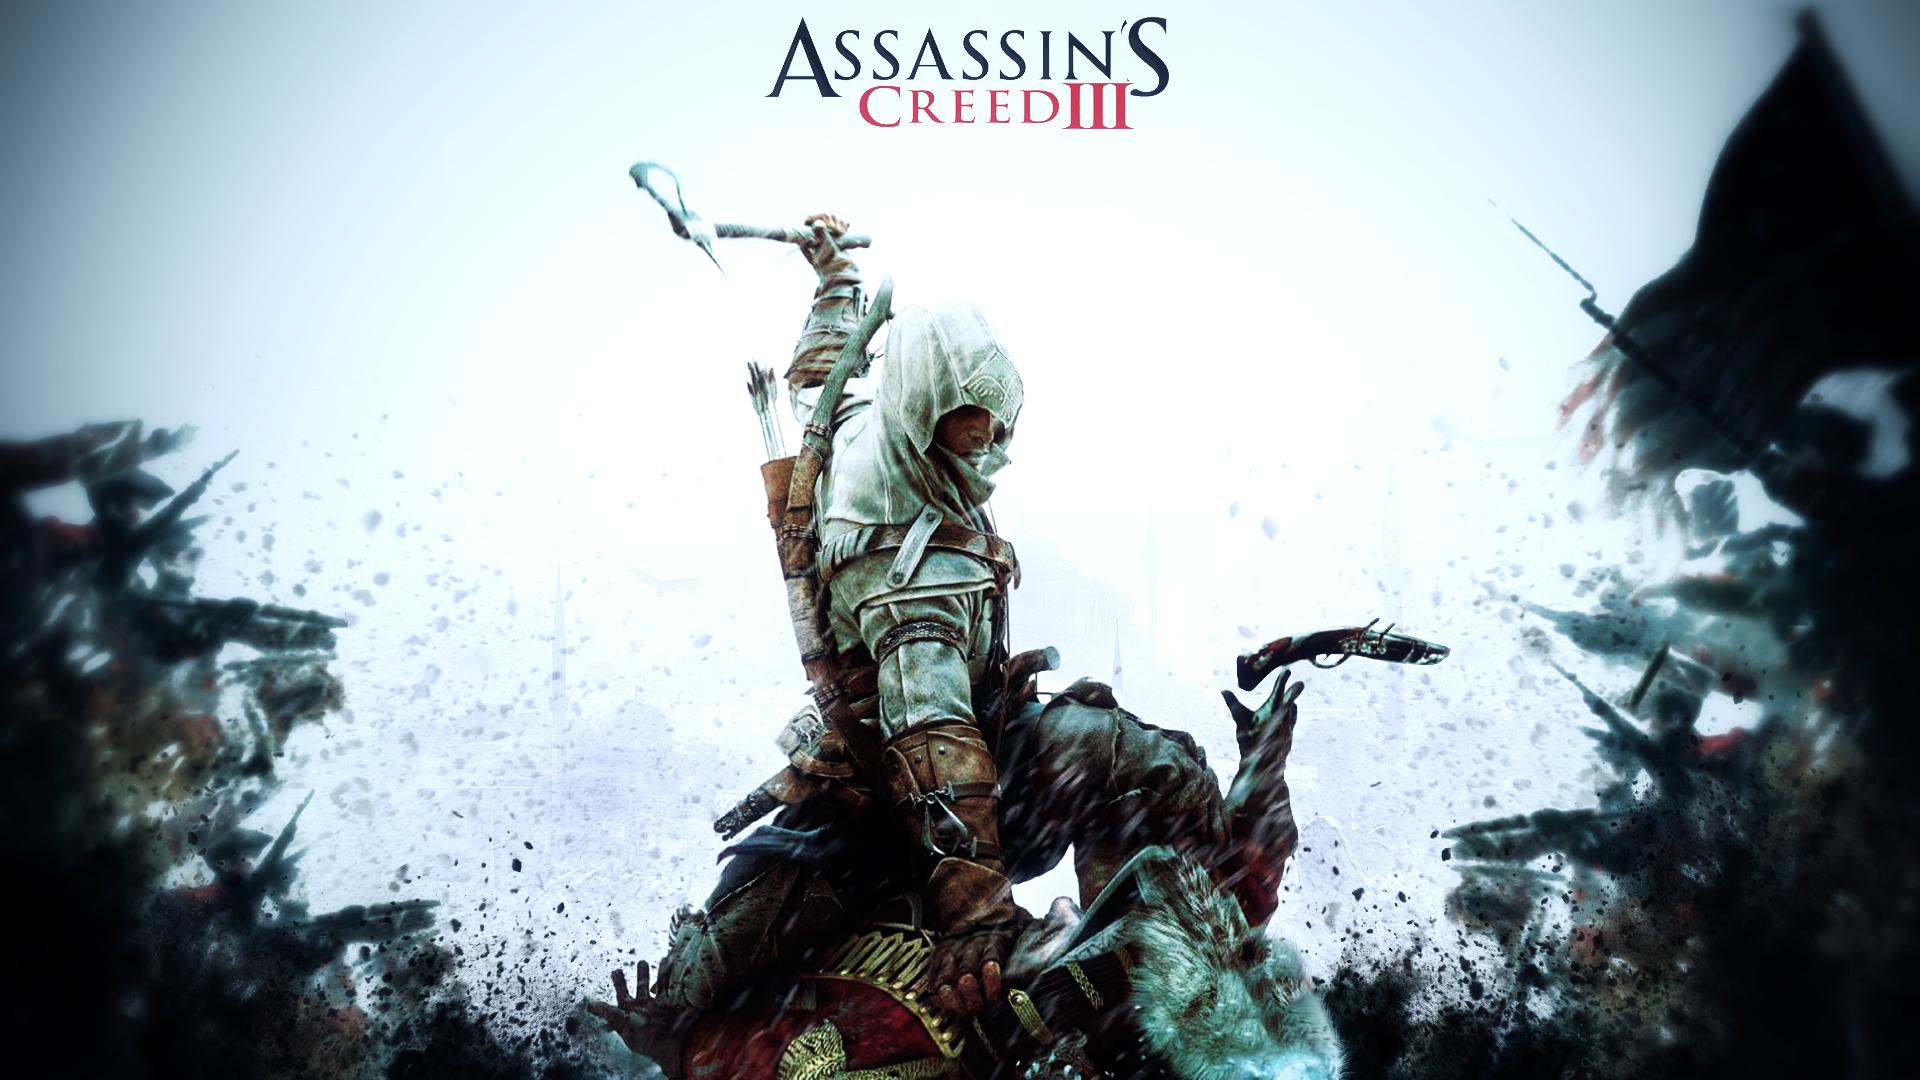 Assassins Creed wallpapers HDparte 2   Taringa 1920x1080